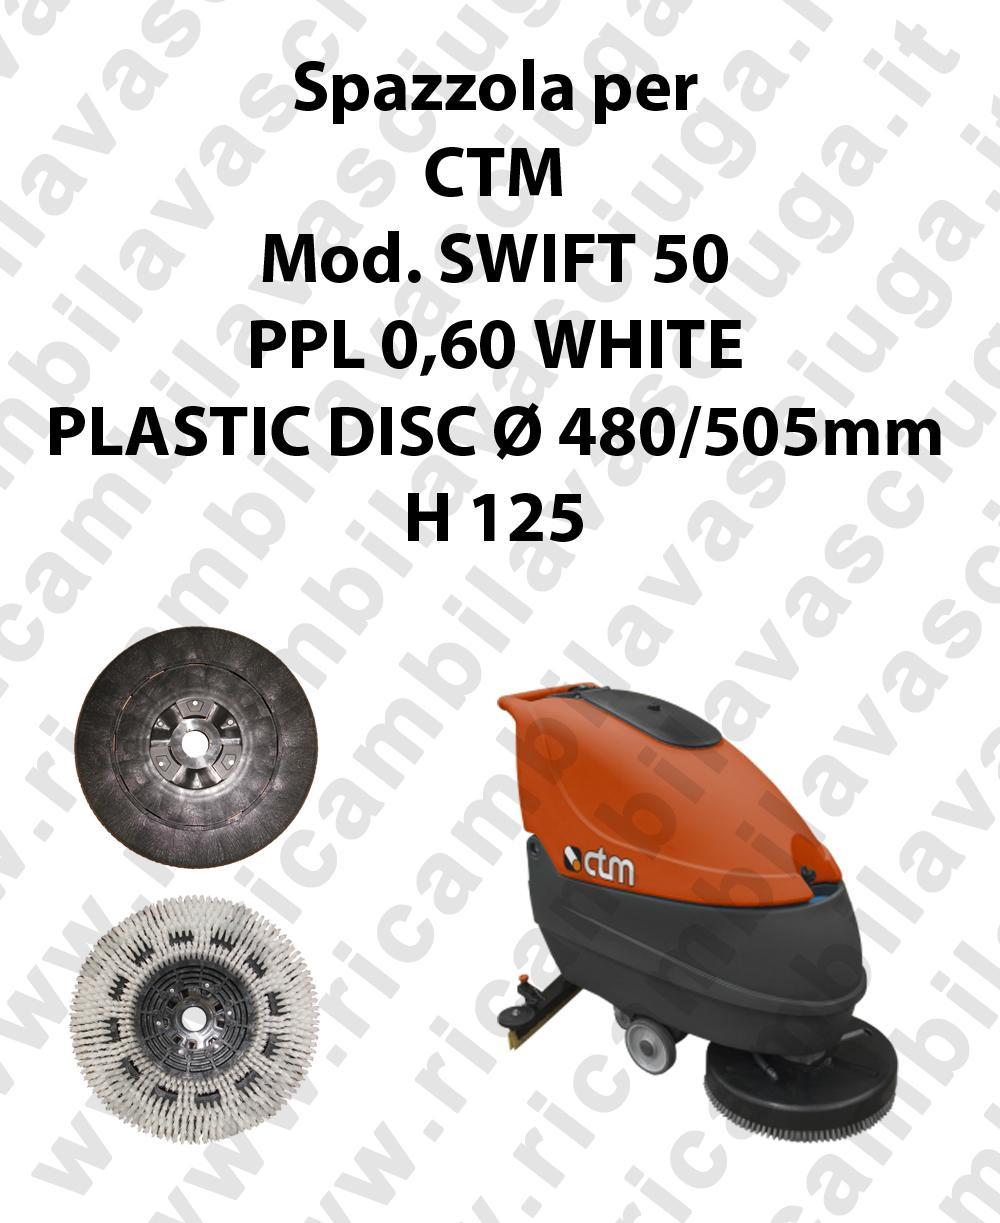 Spazzola lavare PPL 0,60 WHITE per lavapavimenti CTM modello SWIFT 50